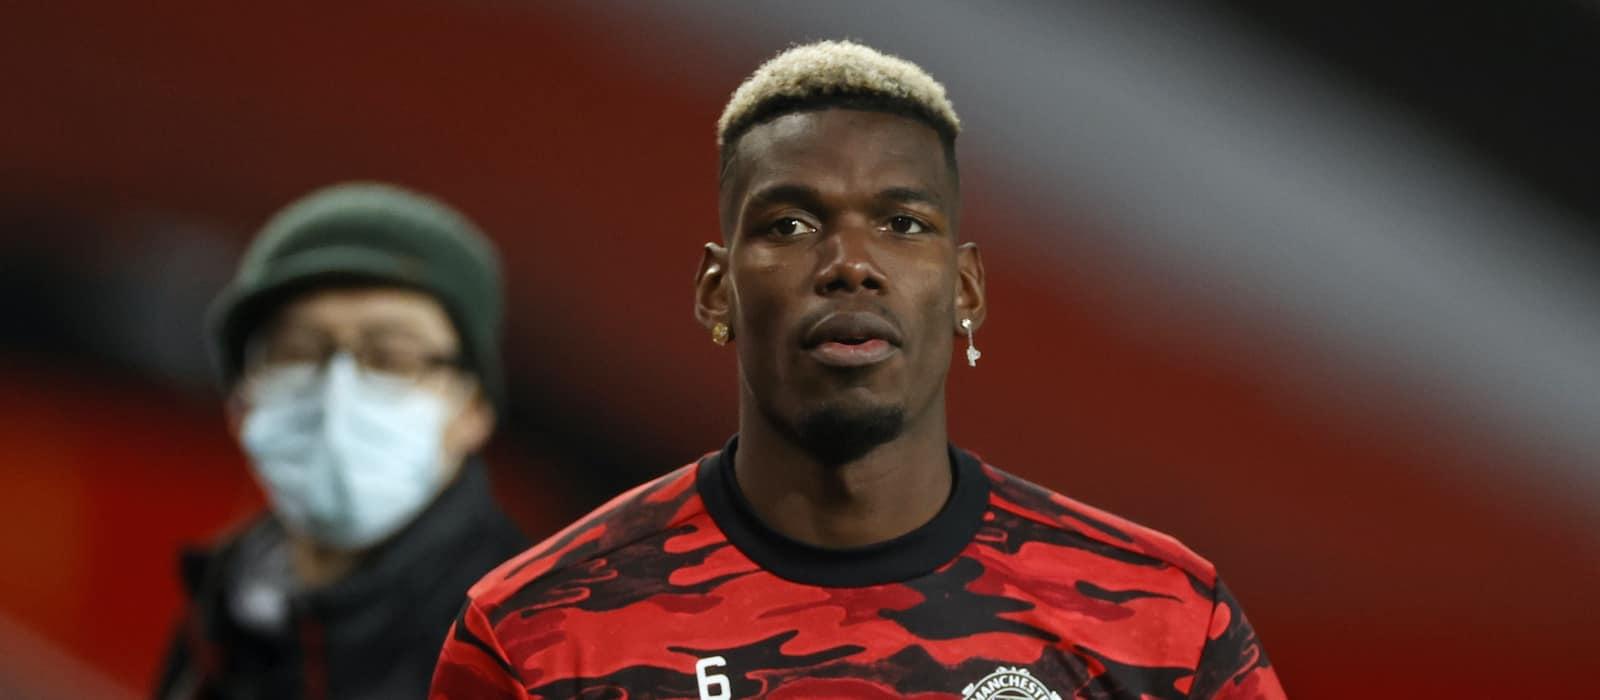 Ole Gunnar Solskjaer responds to question on Paul Pogba's future